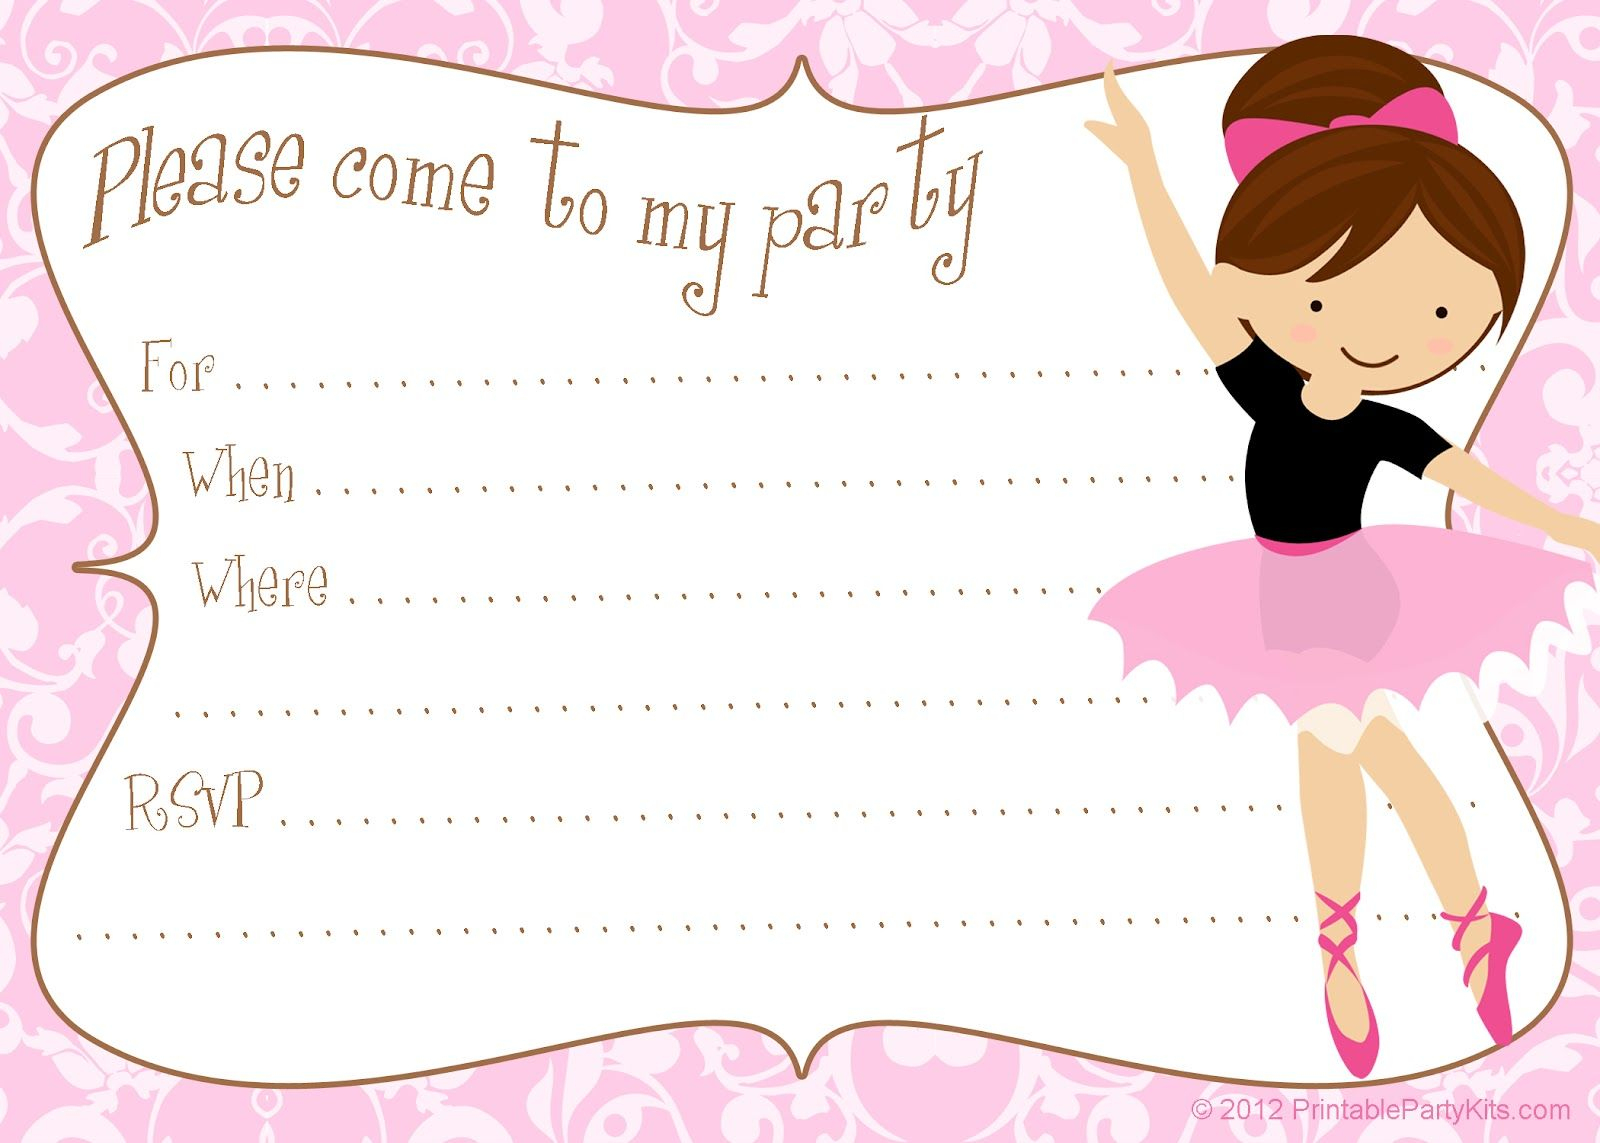 Printable Free Diy Ballerina Party Invitations | Party Printables - Free Printable Ballerina Birthday Invitations